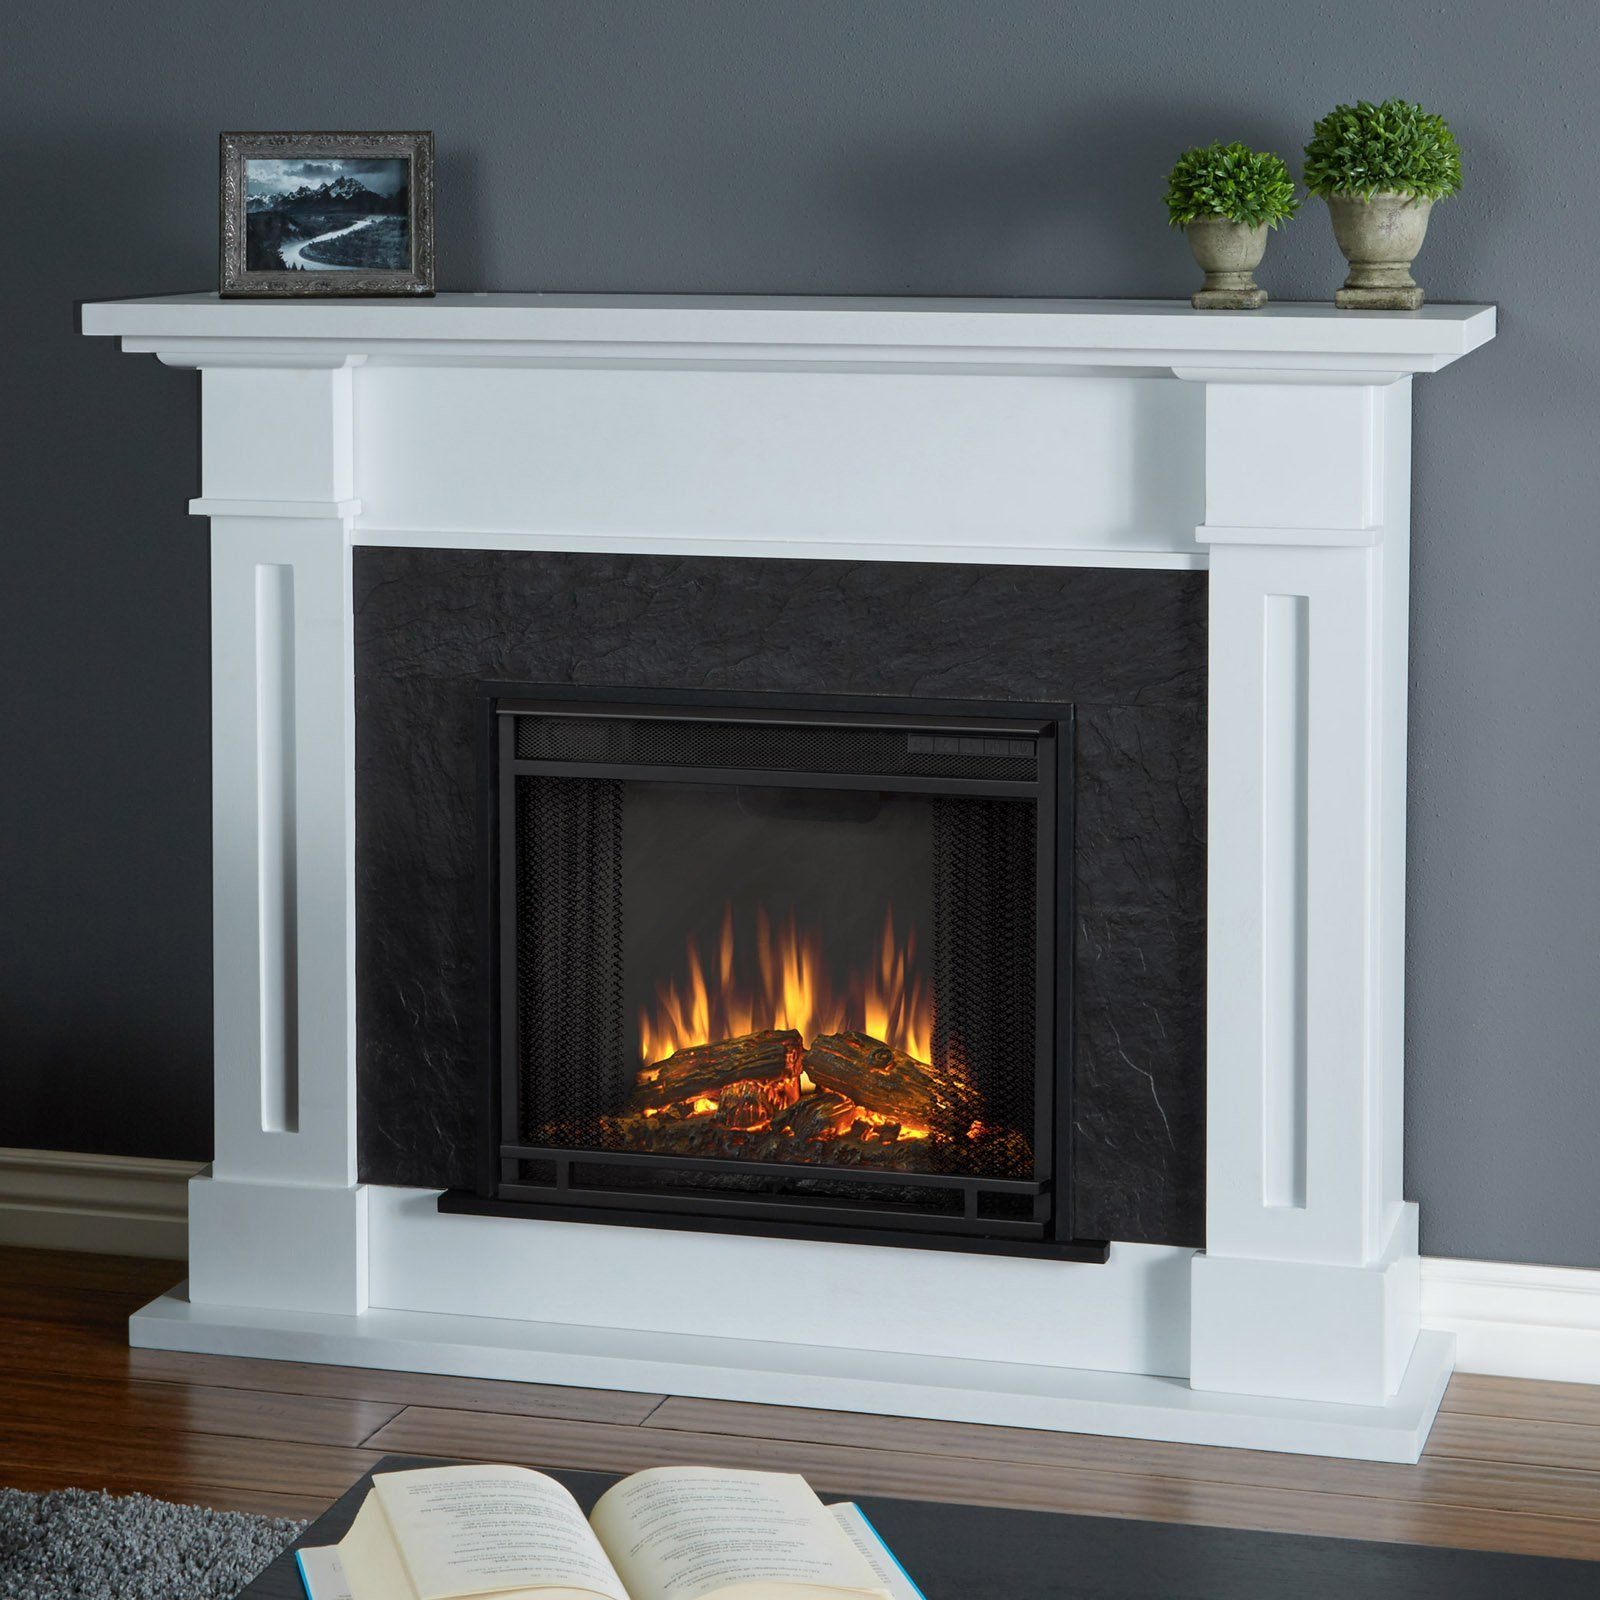 Electric fireplace bioethanol traditional open hearth ELDA